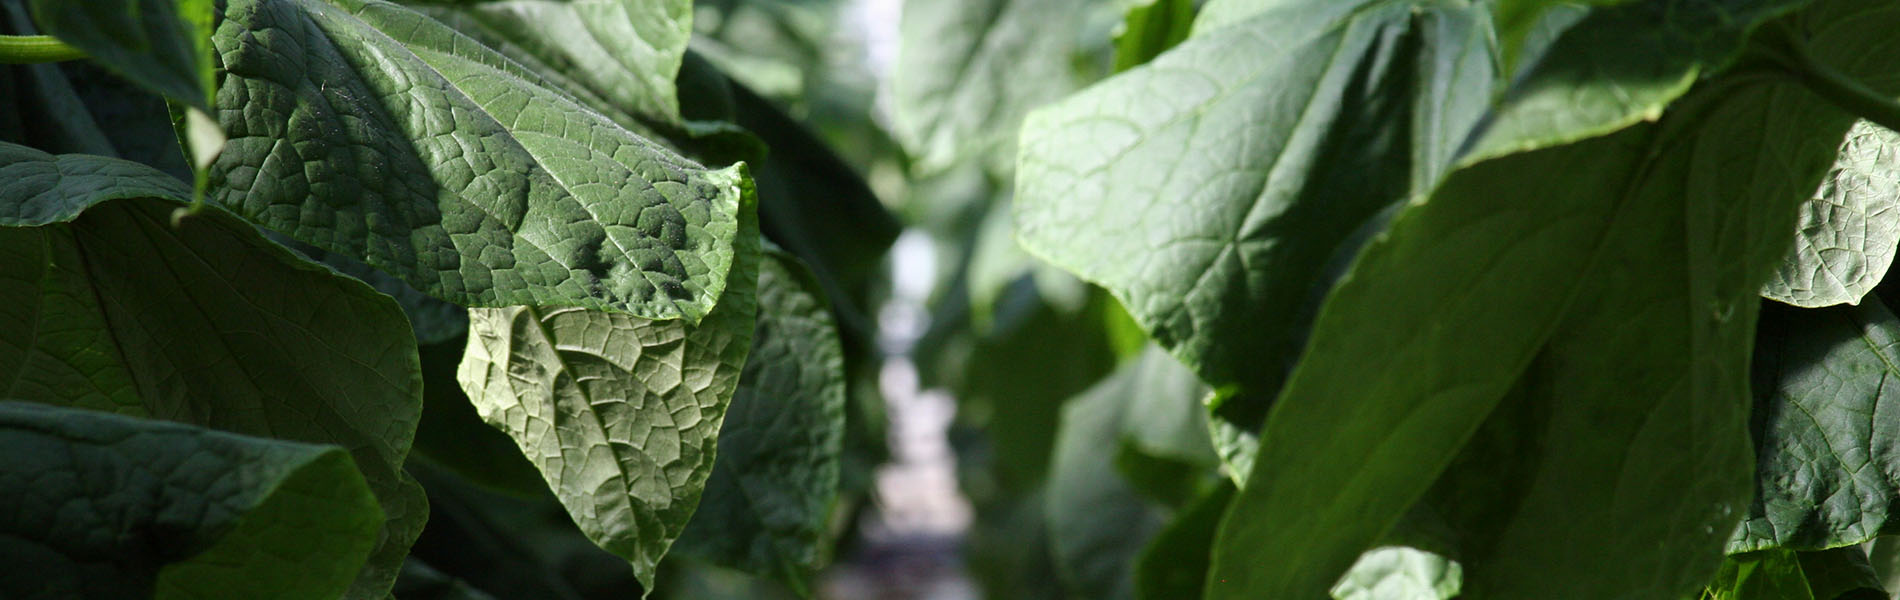 Concombres feuilles